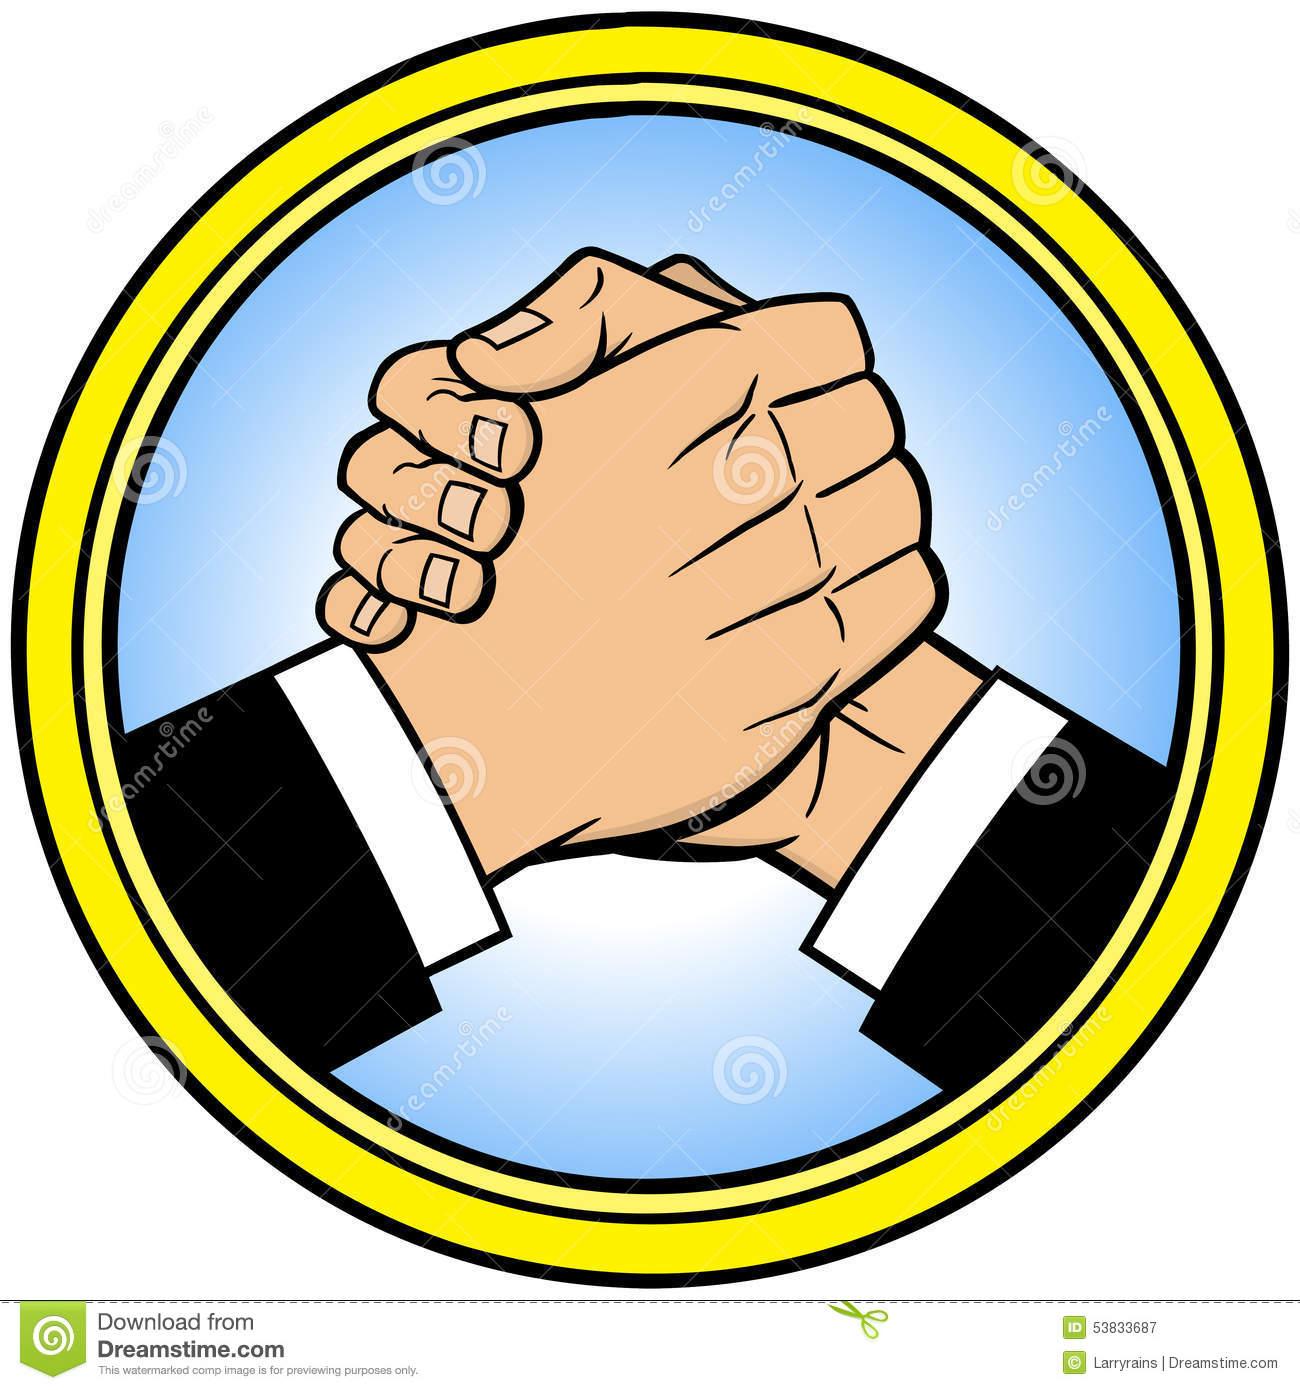 Brotherhood clipart trust Clipart handshake handshake clipart Brotherhood